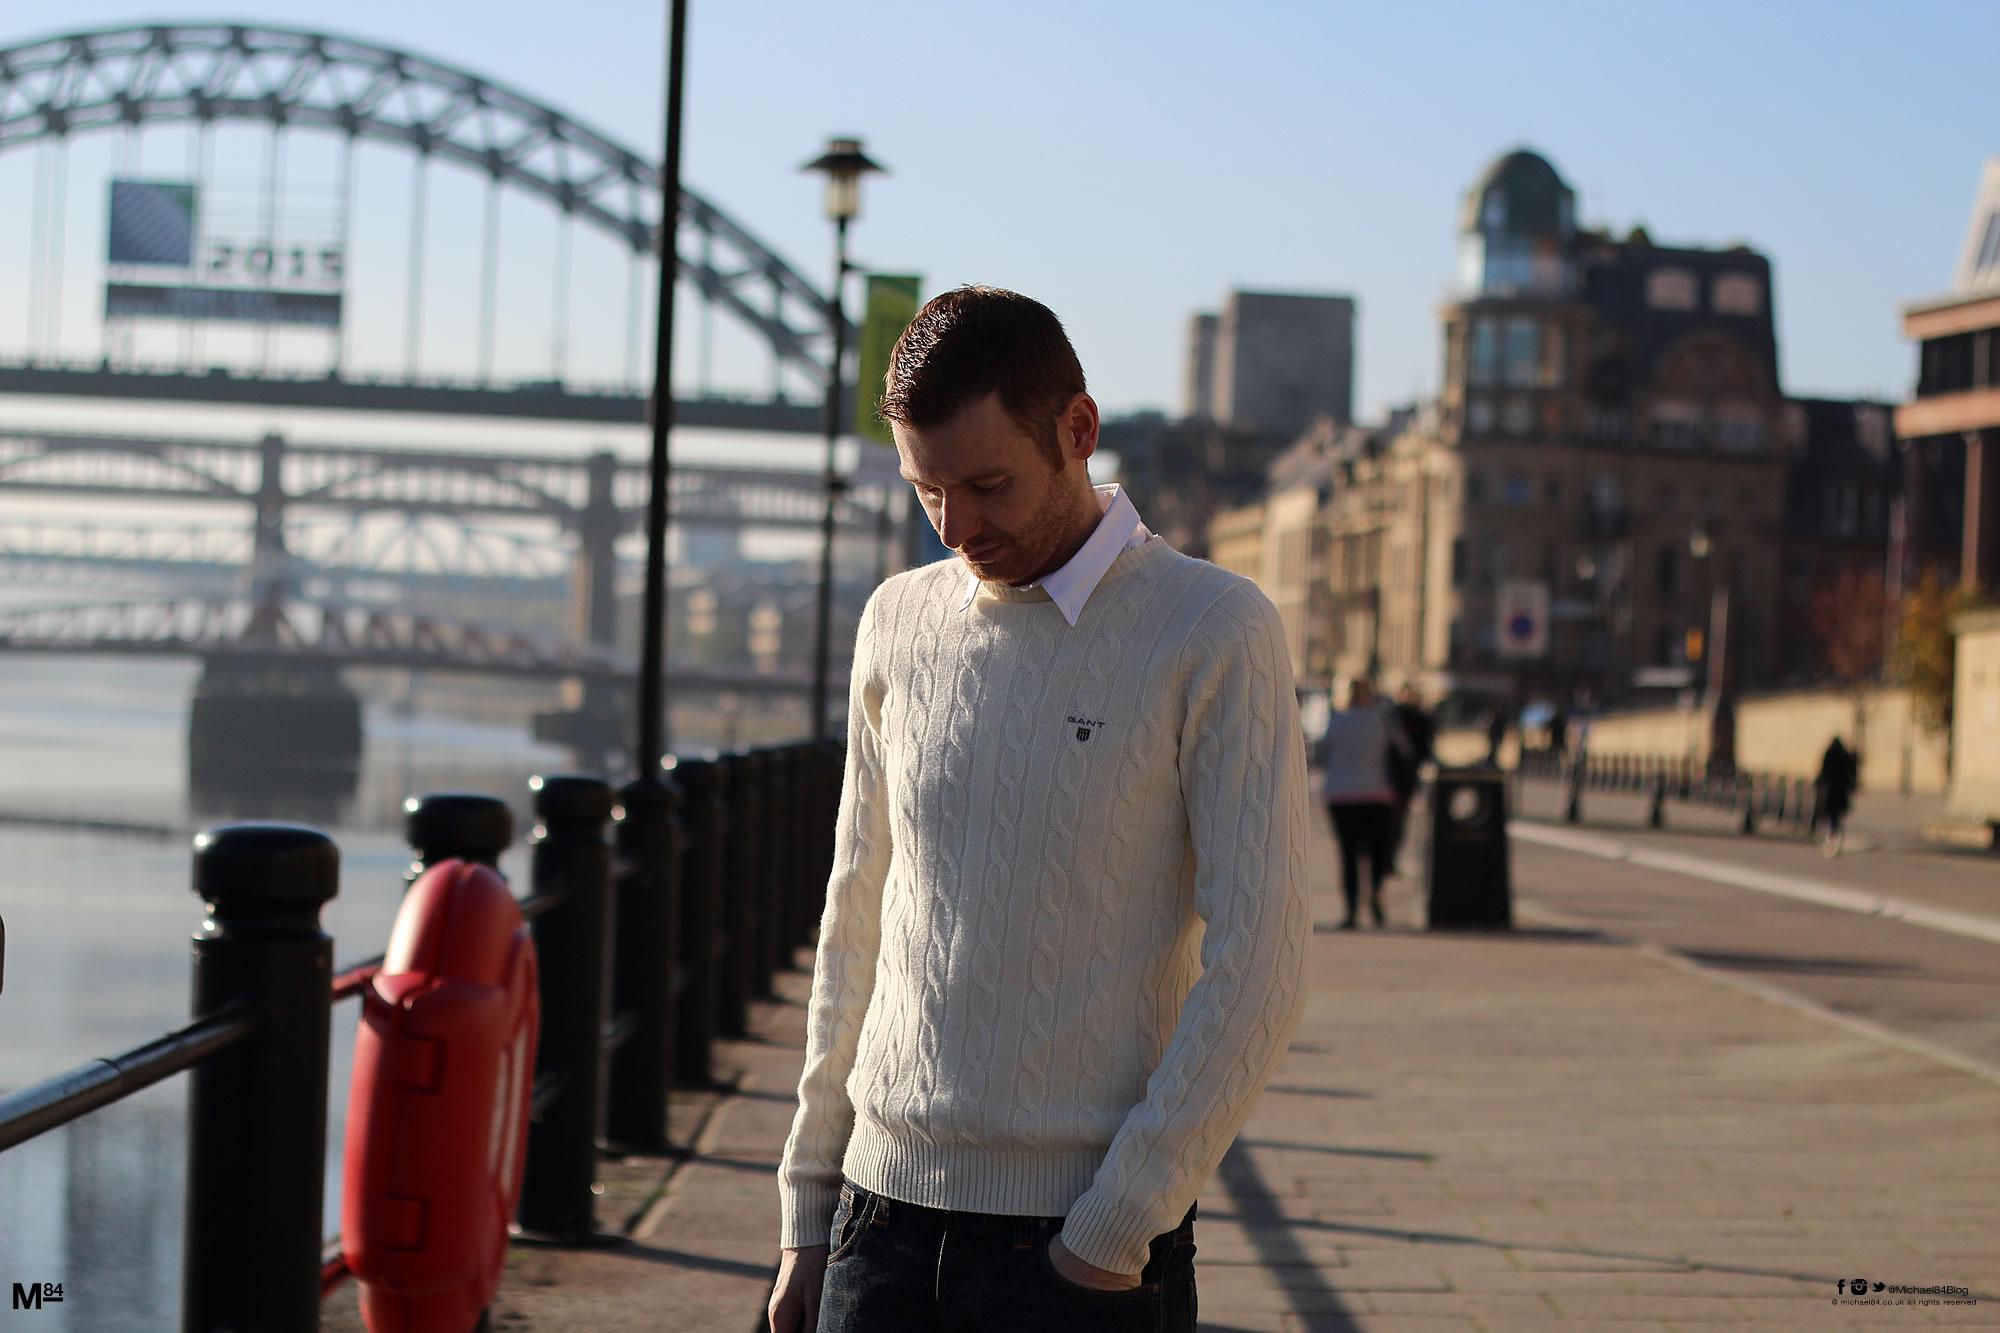 Men's Jumpers & Knitwear Guide: The Best 18 Mens Sweaters